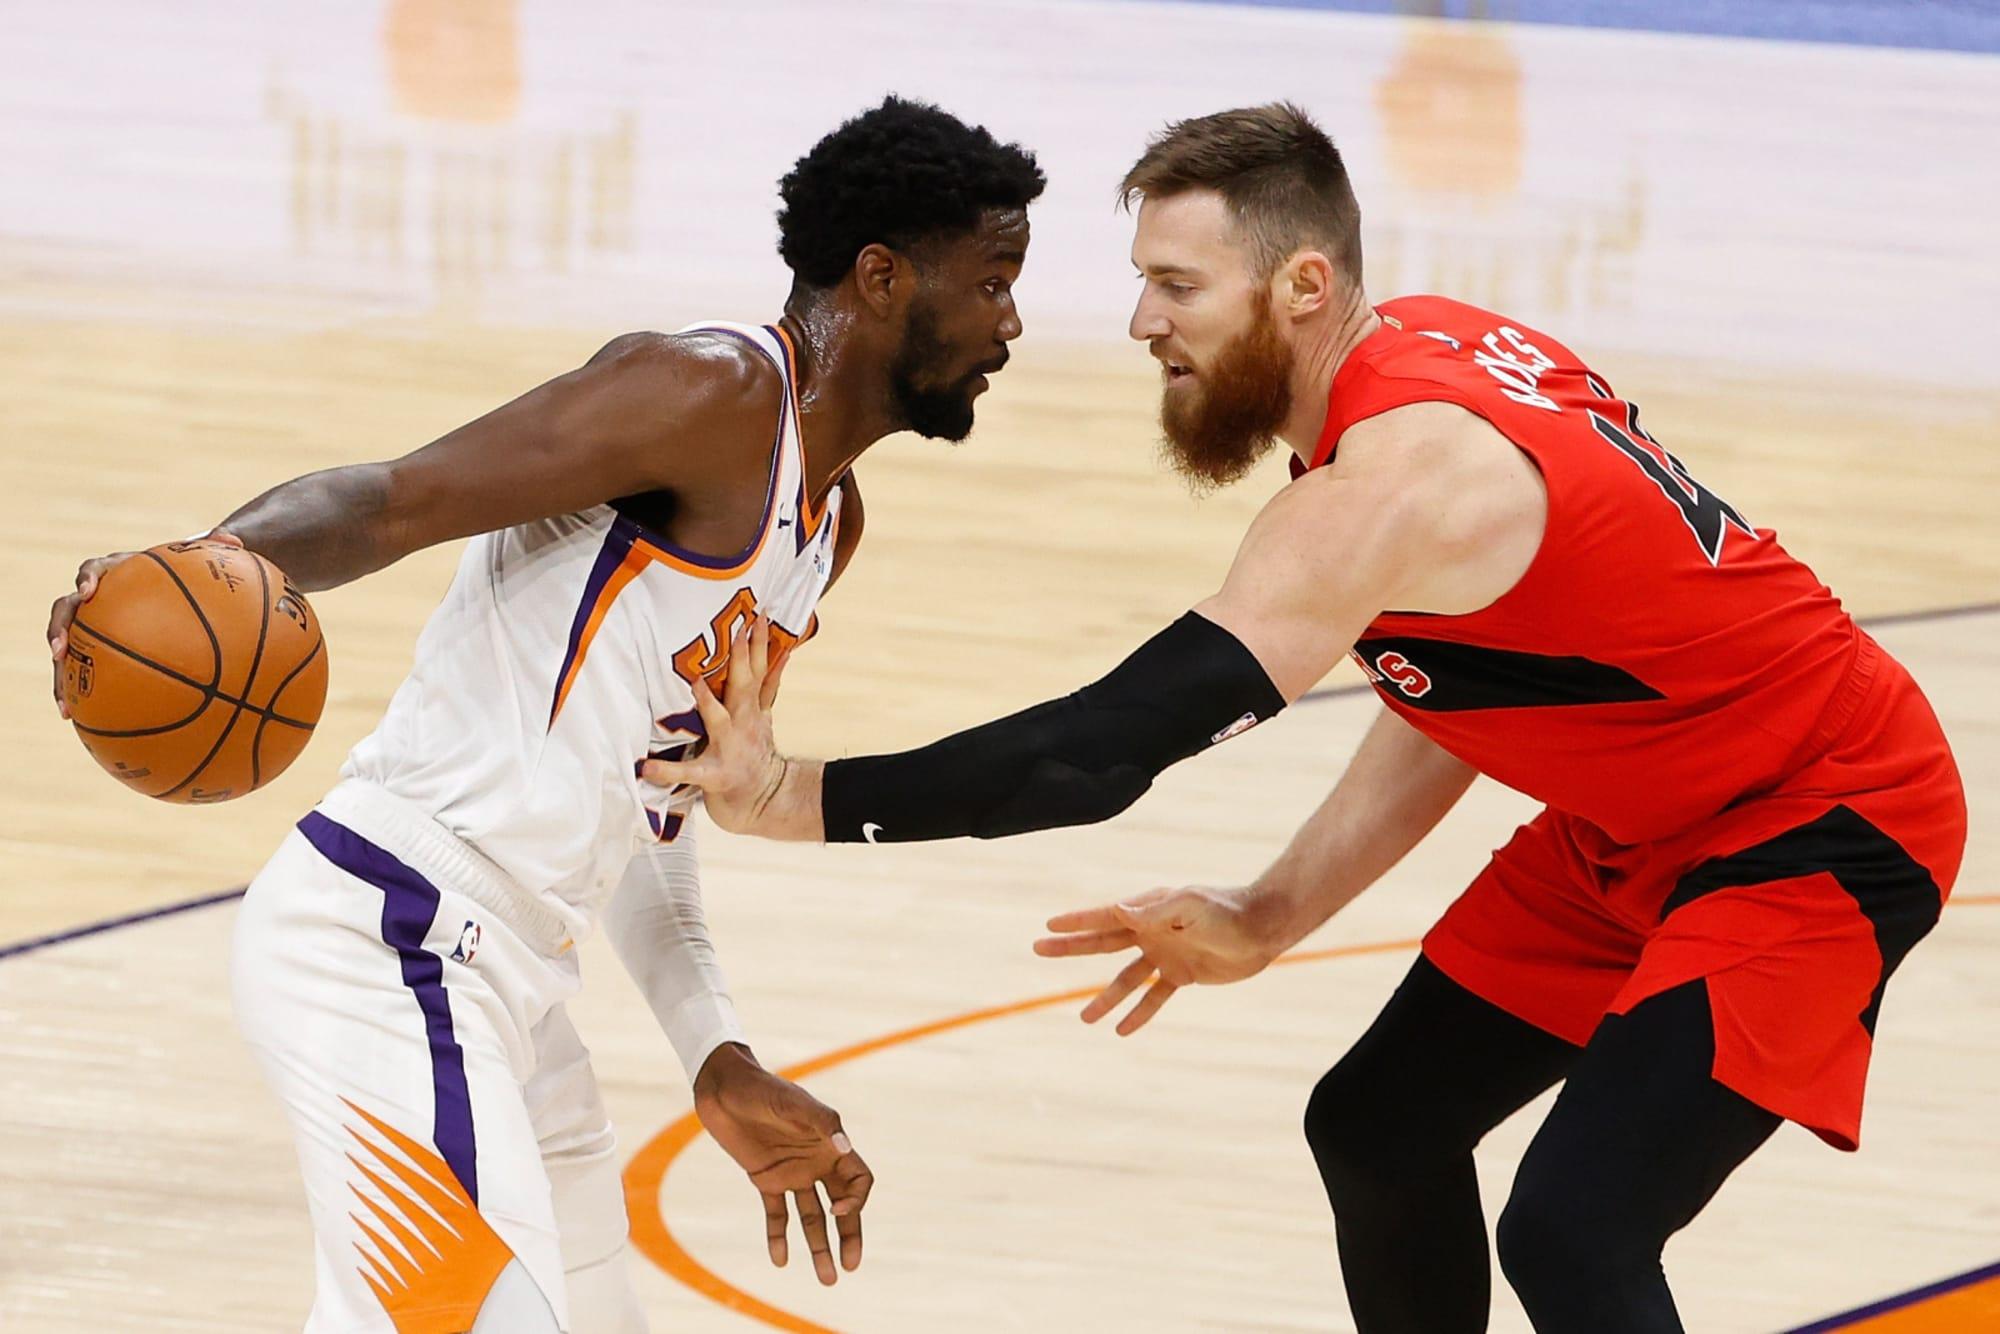 Raptors: Should Toronto check in on a Deandre Ayton trade?